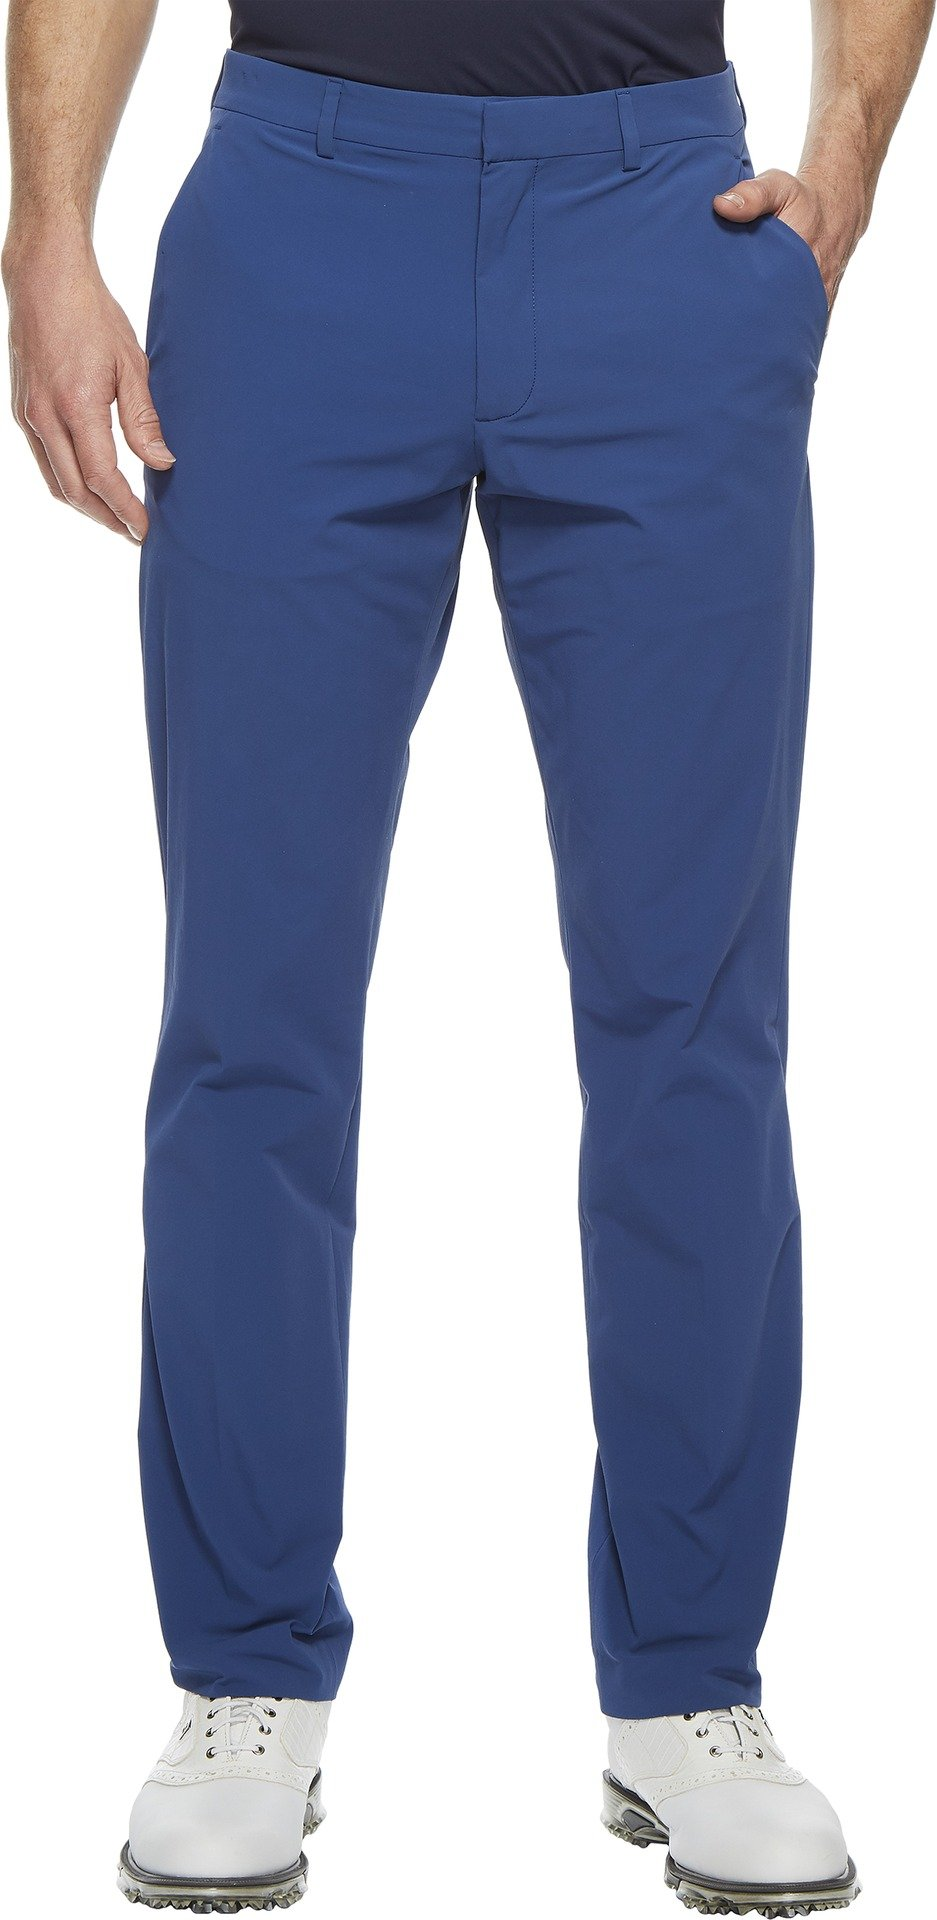 Perry Ellis Men's Slim Fit Solid Stretch Tech Chino Pant, Bright Sapphire, 38W X 32L